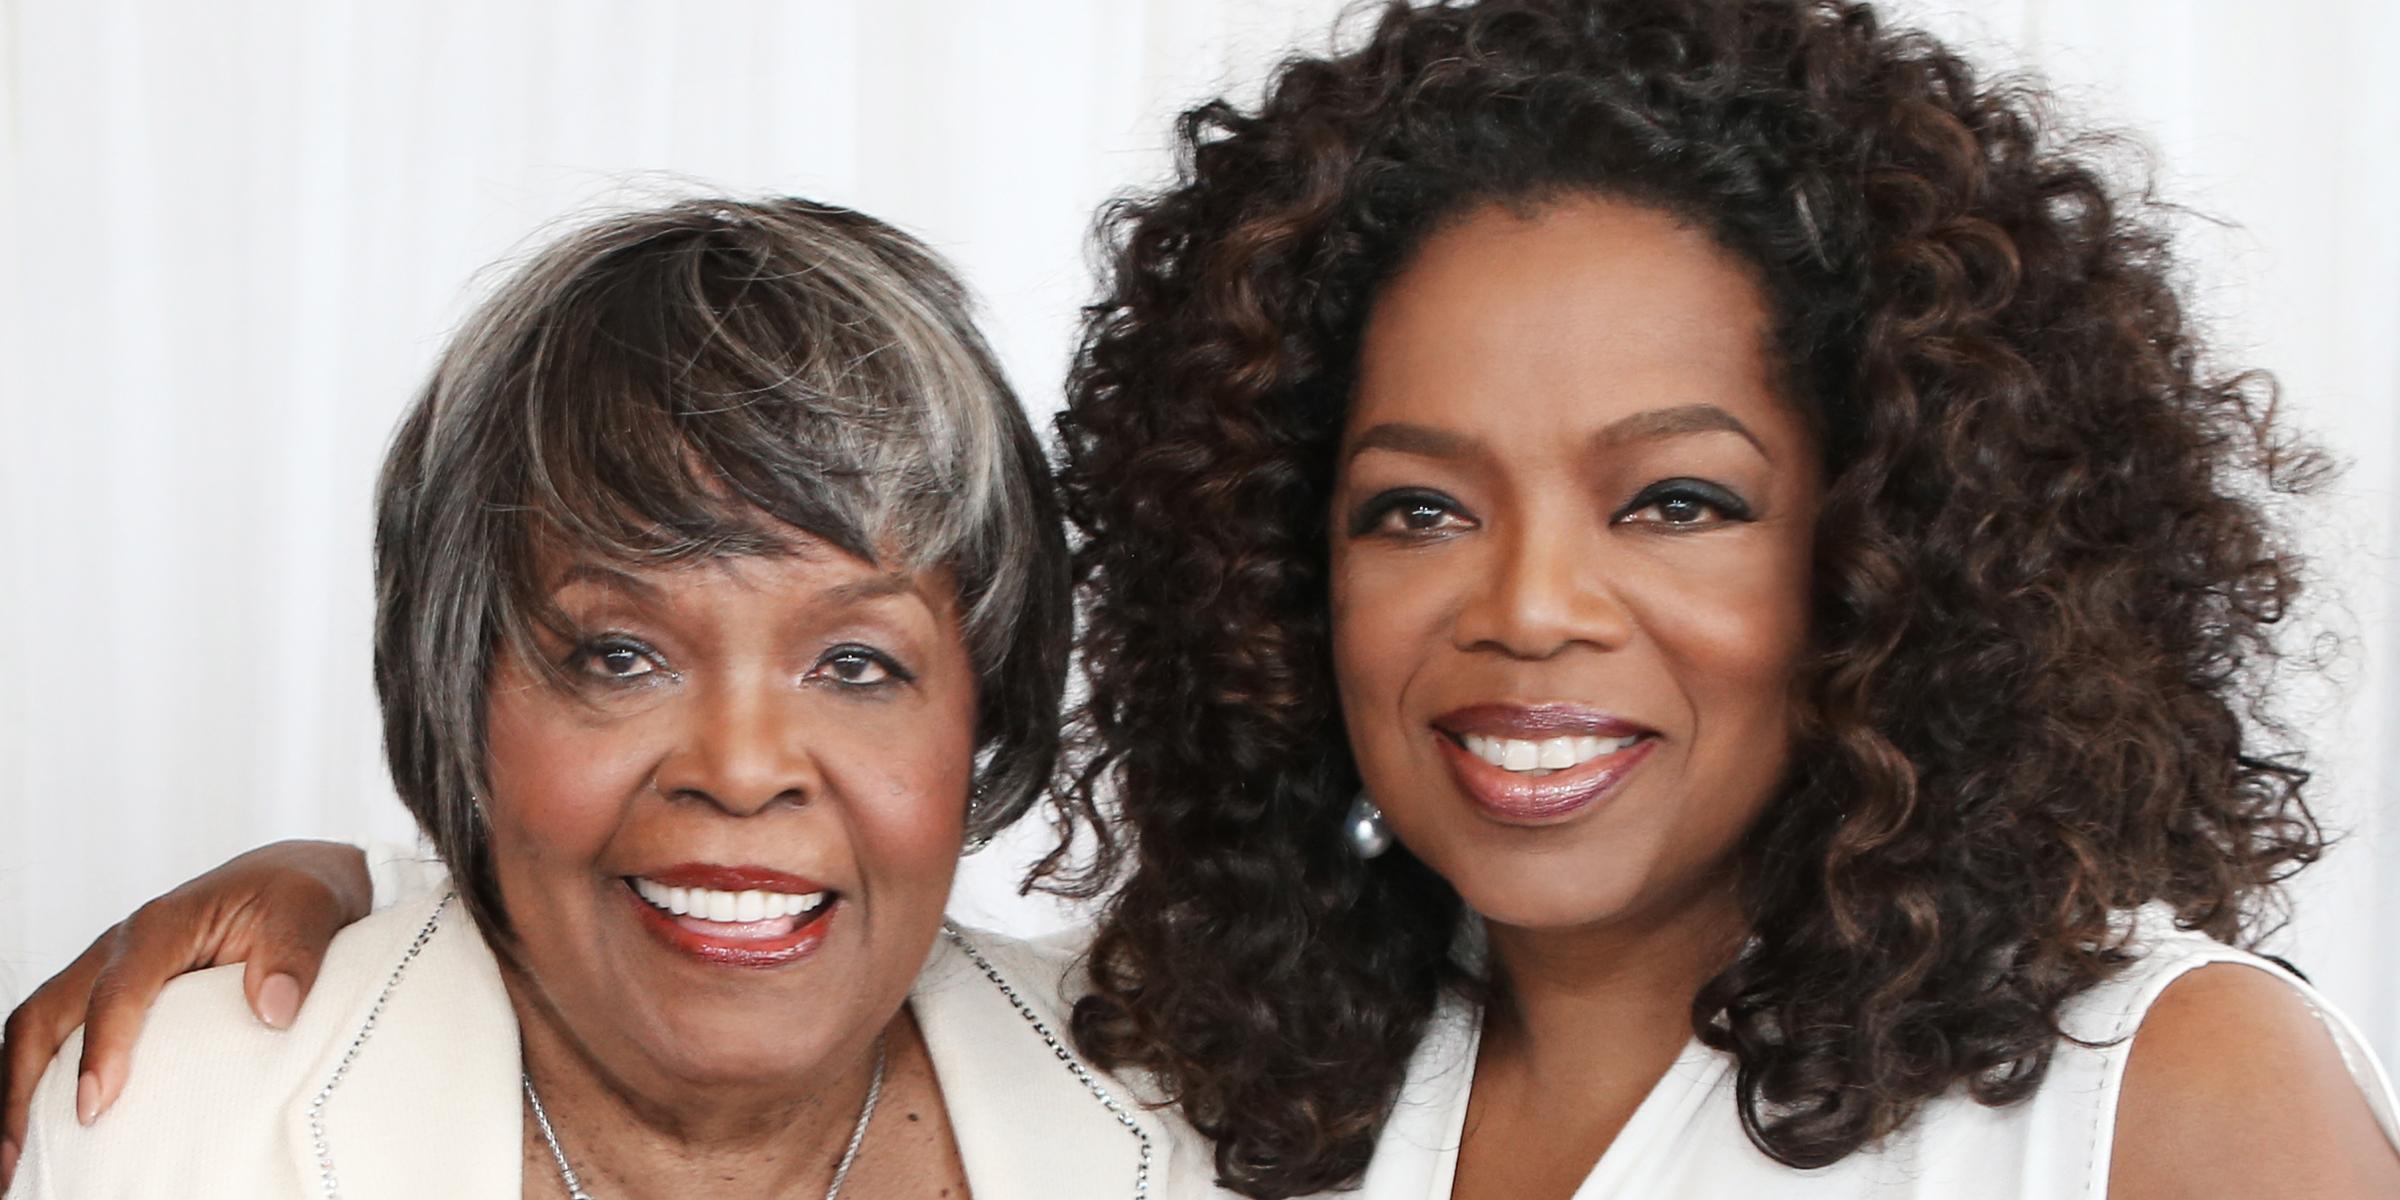 Oprah oprah) Instagram photos and videos